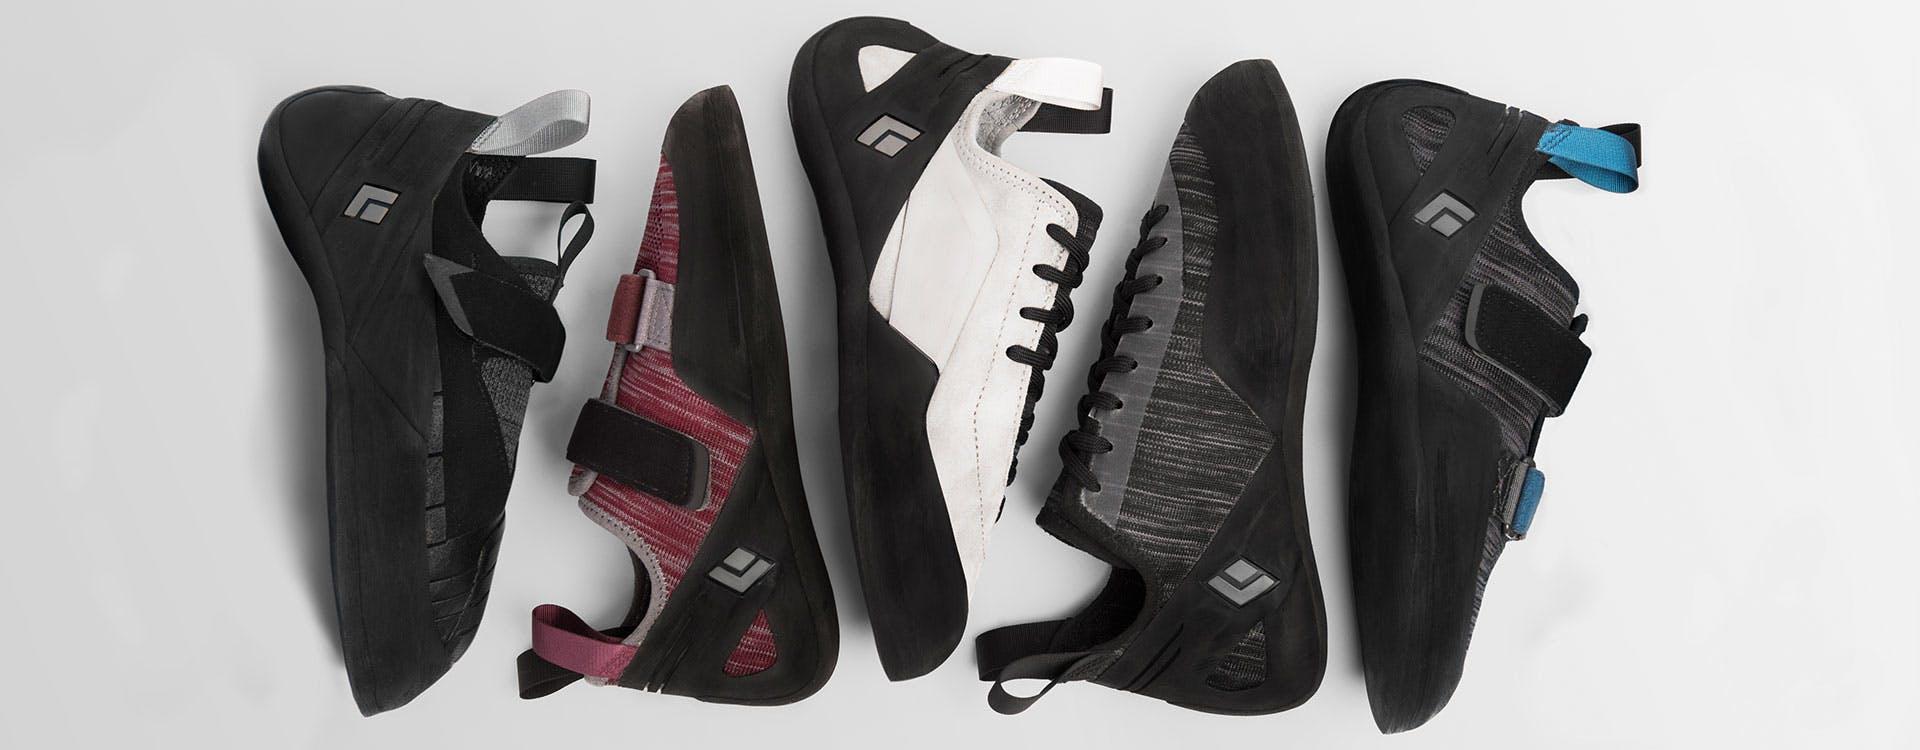 Black Diamond shoe lineup